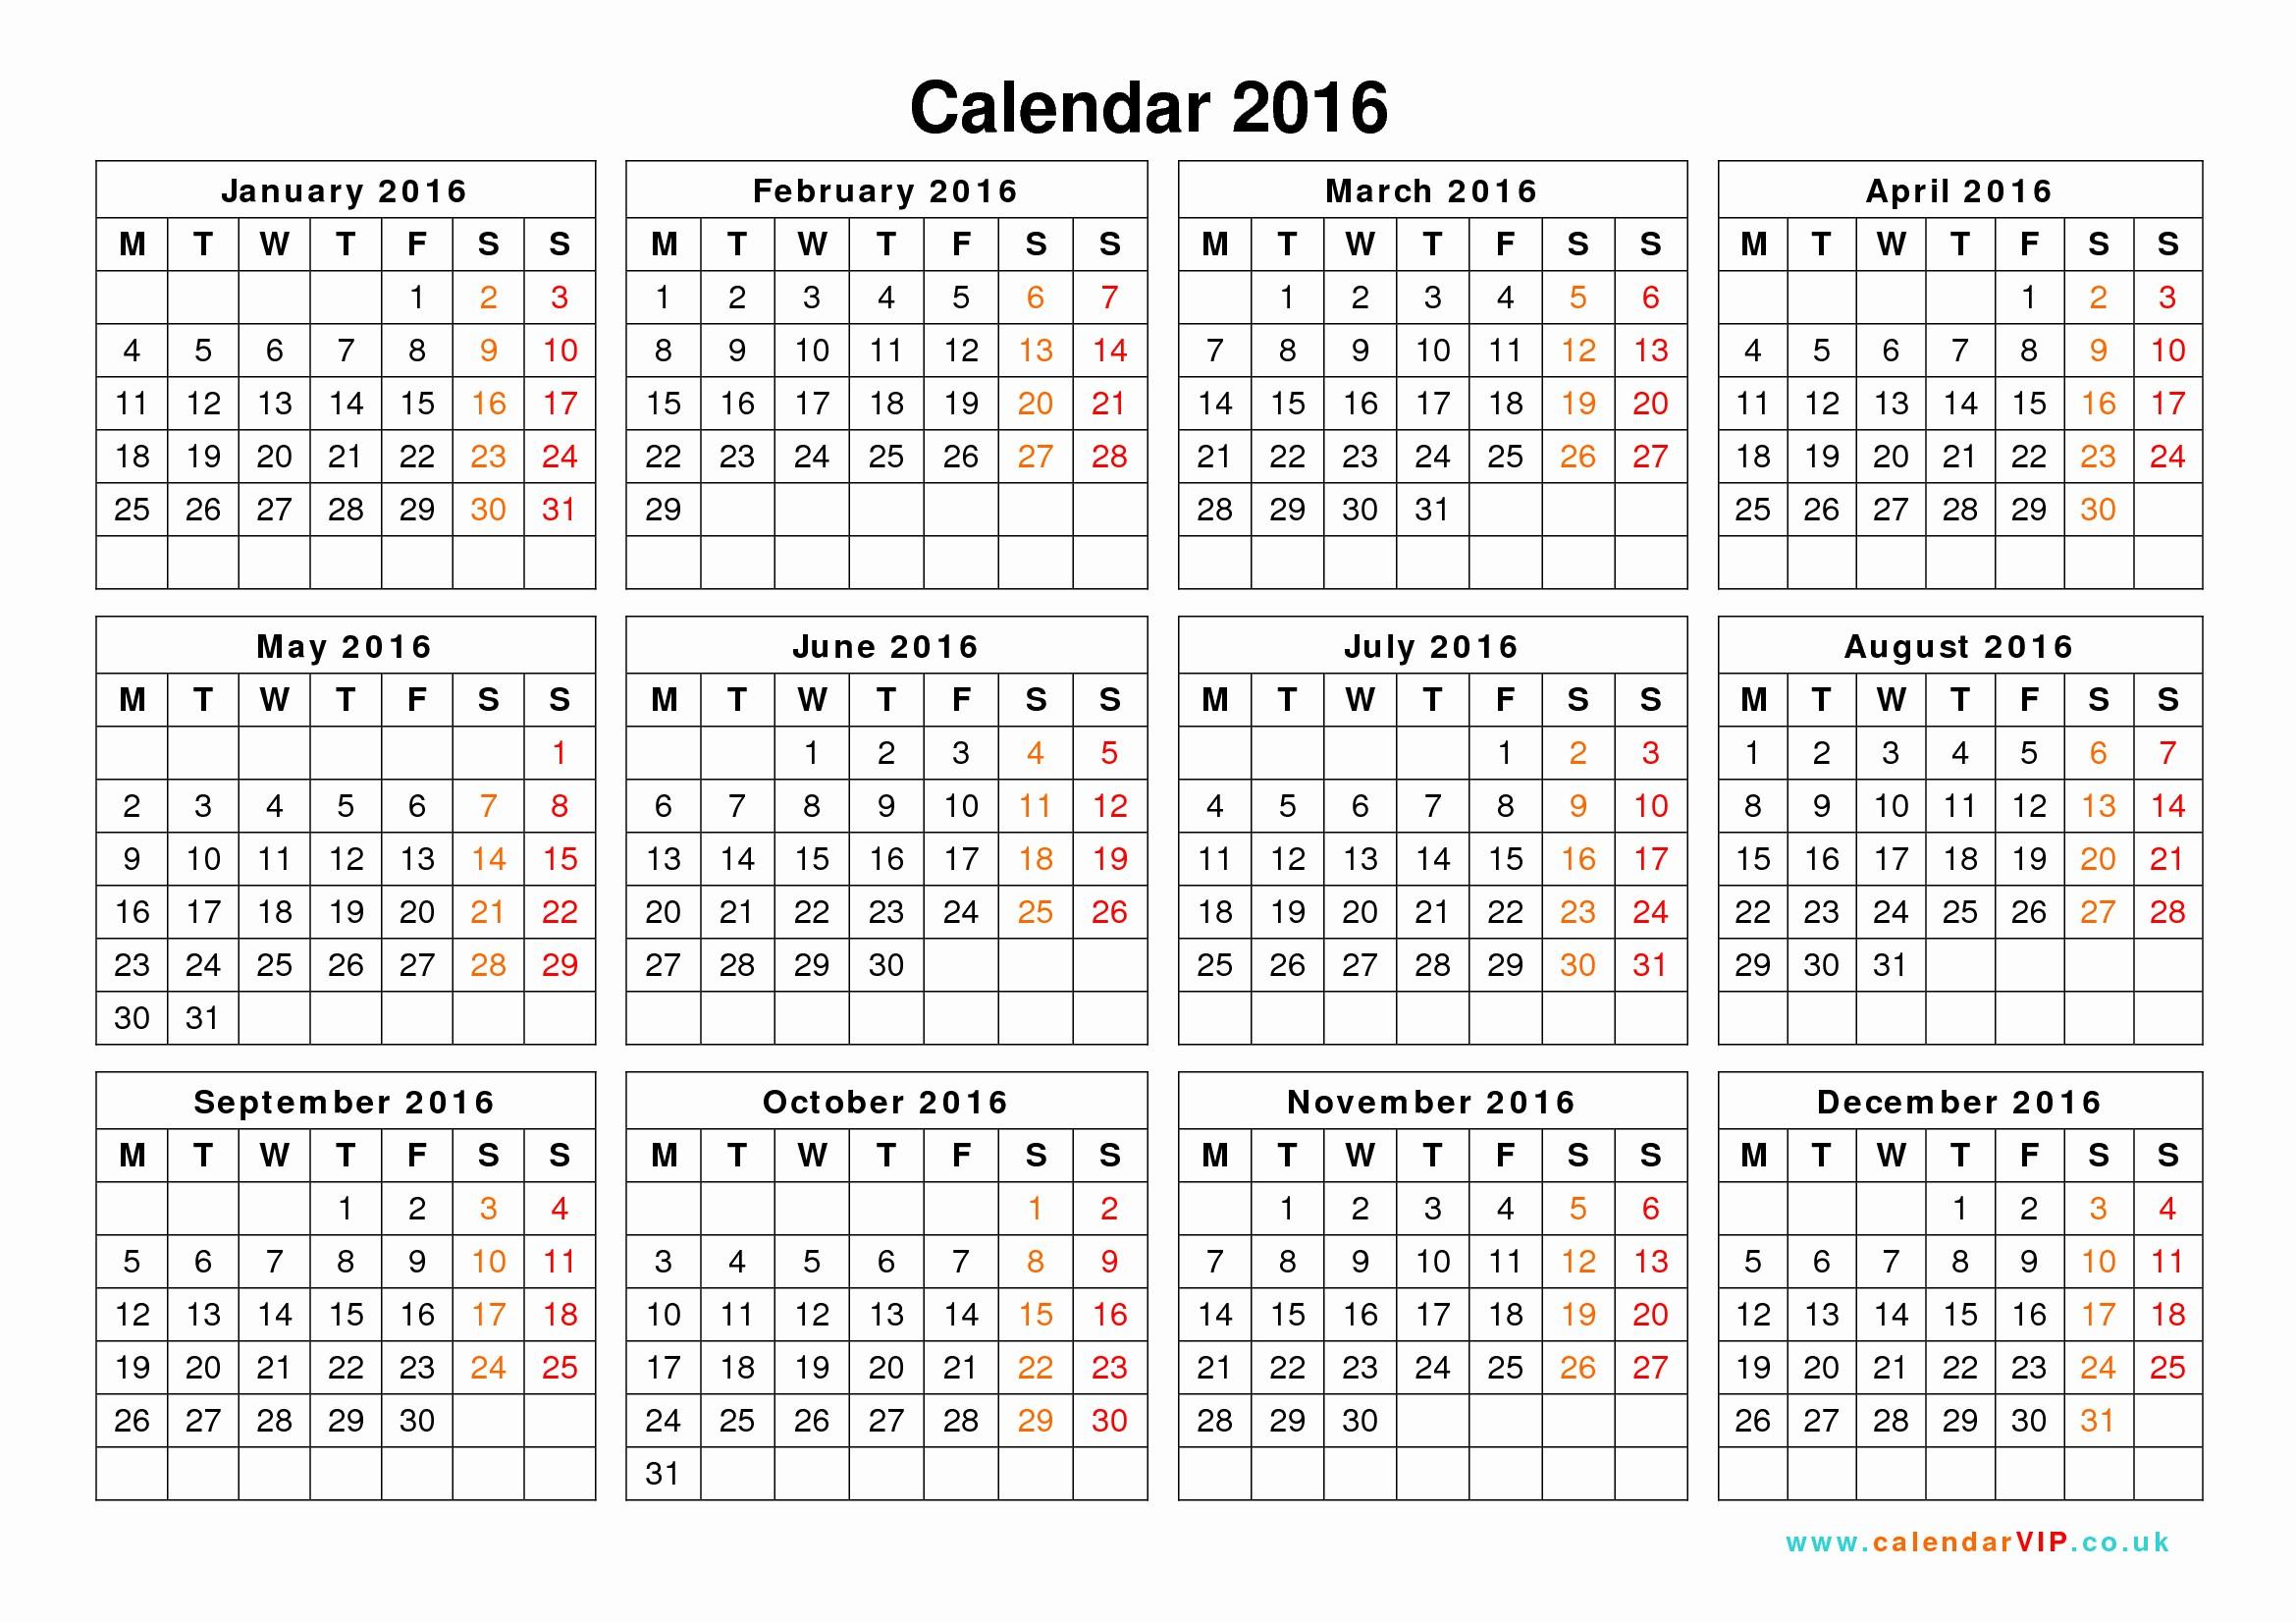 Free Printable Calendars 2016 Templates Luxury Calendar 2016 Uk Free Yearly Calendar Templates for Uk